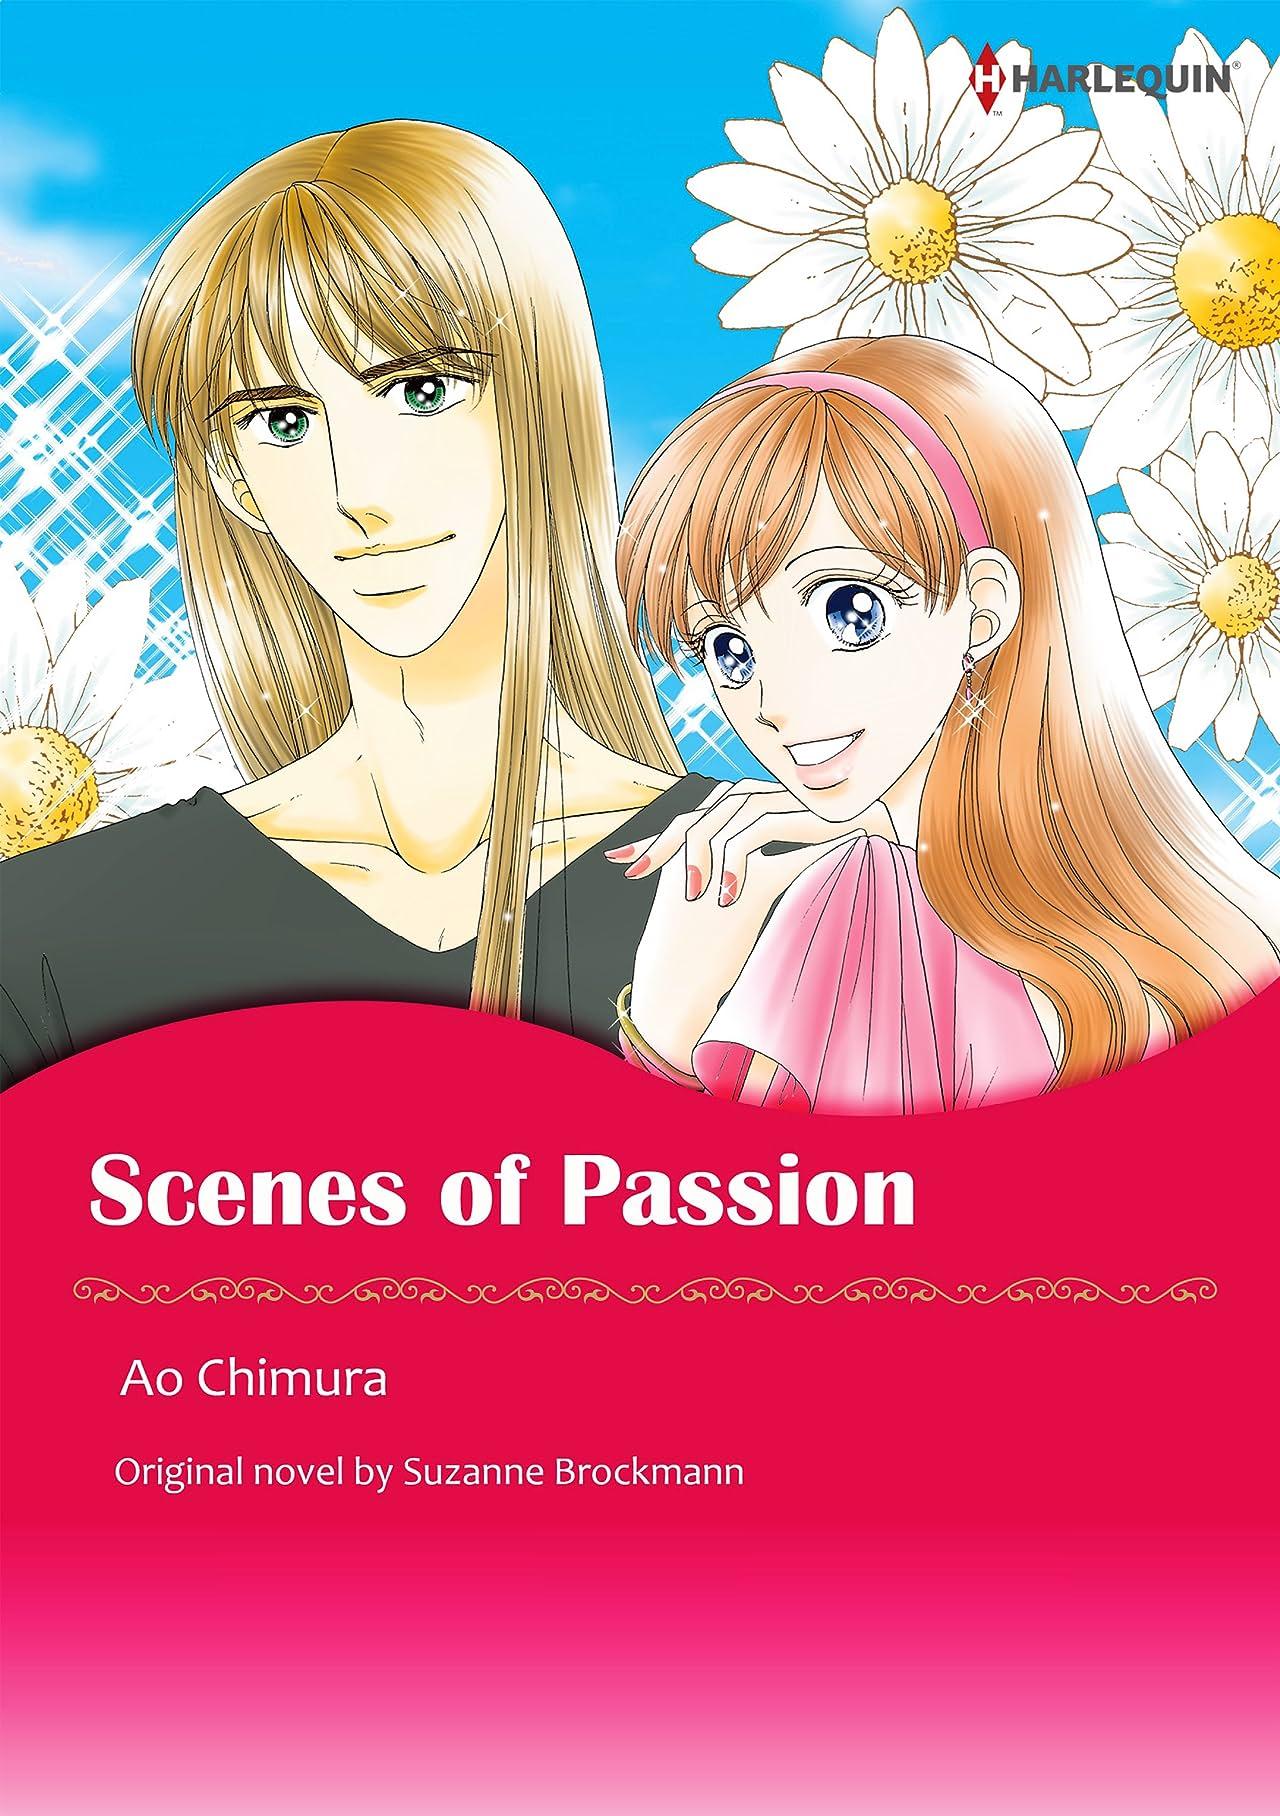 Scenes of Passion